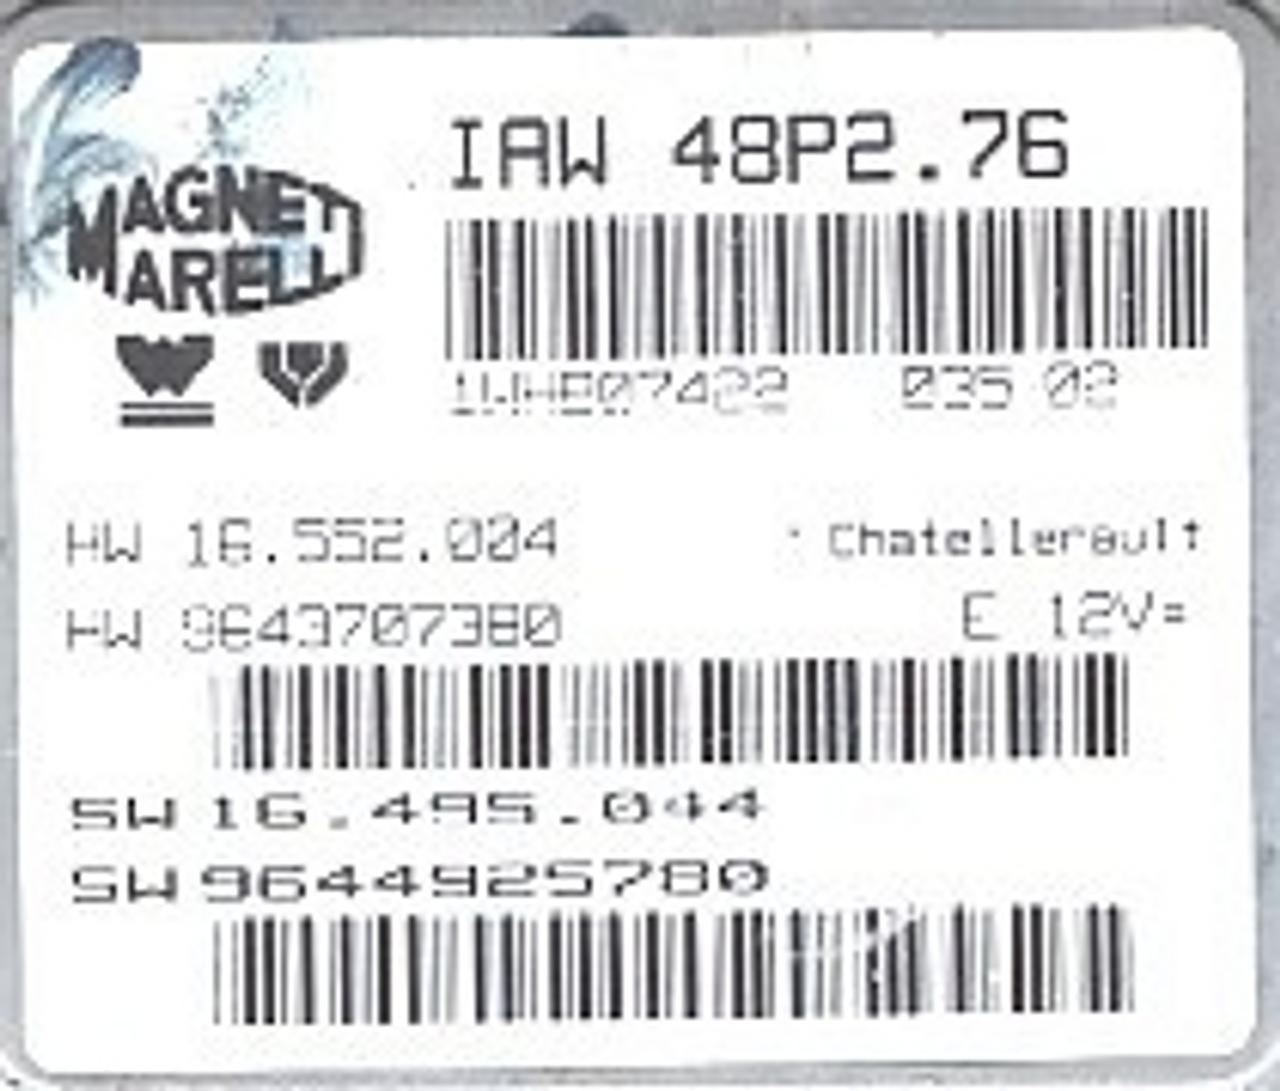 Magneti Marelli, IAW 48P2.76, HW 16.552.004, HW 9643707380, SW 16.495.044, SW 9644925780